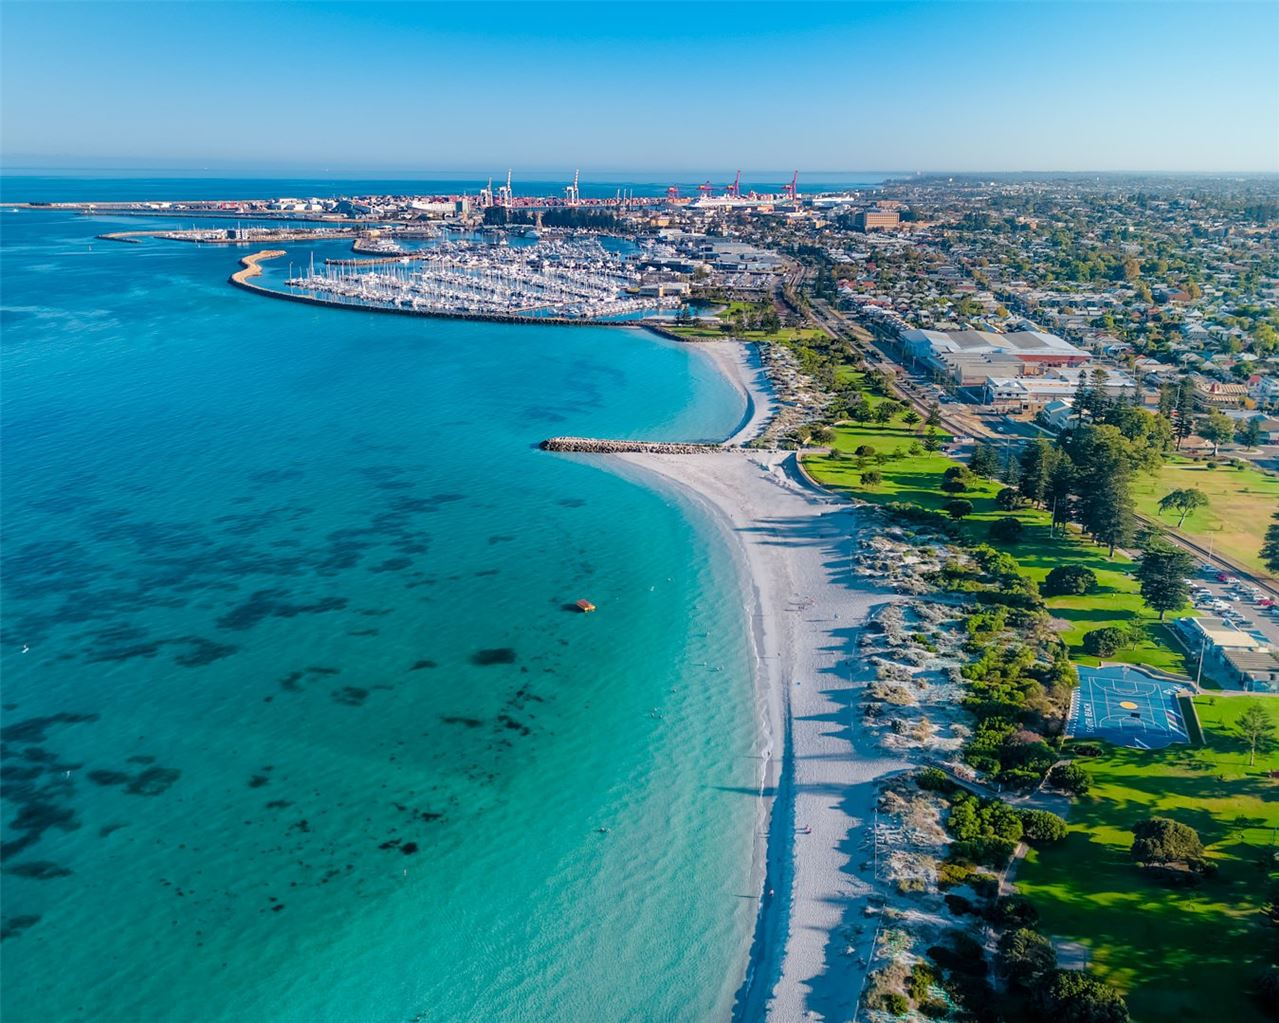 Fremantle South Beach and Fremantle Yacht Club